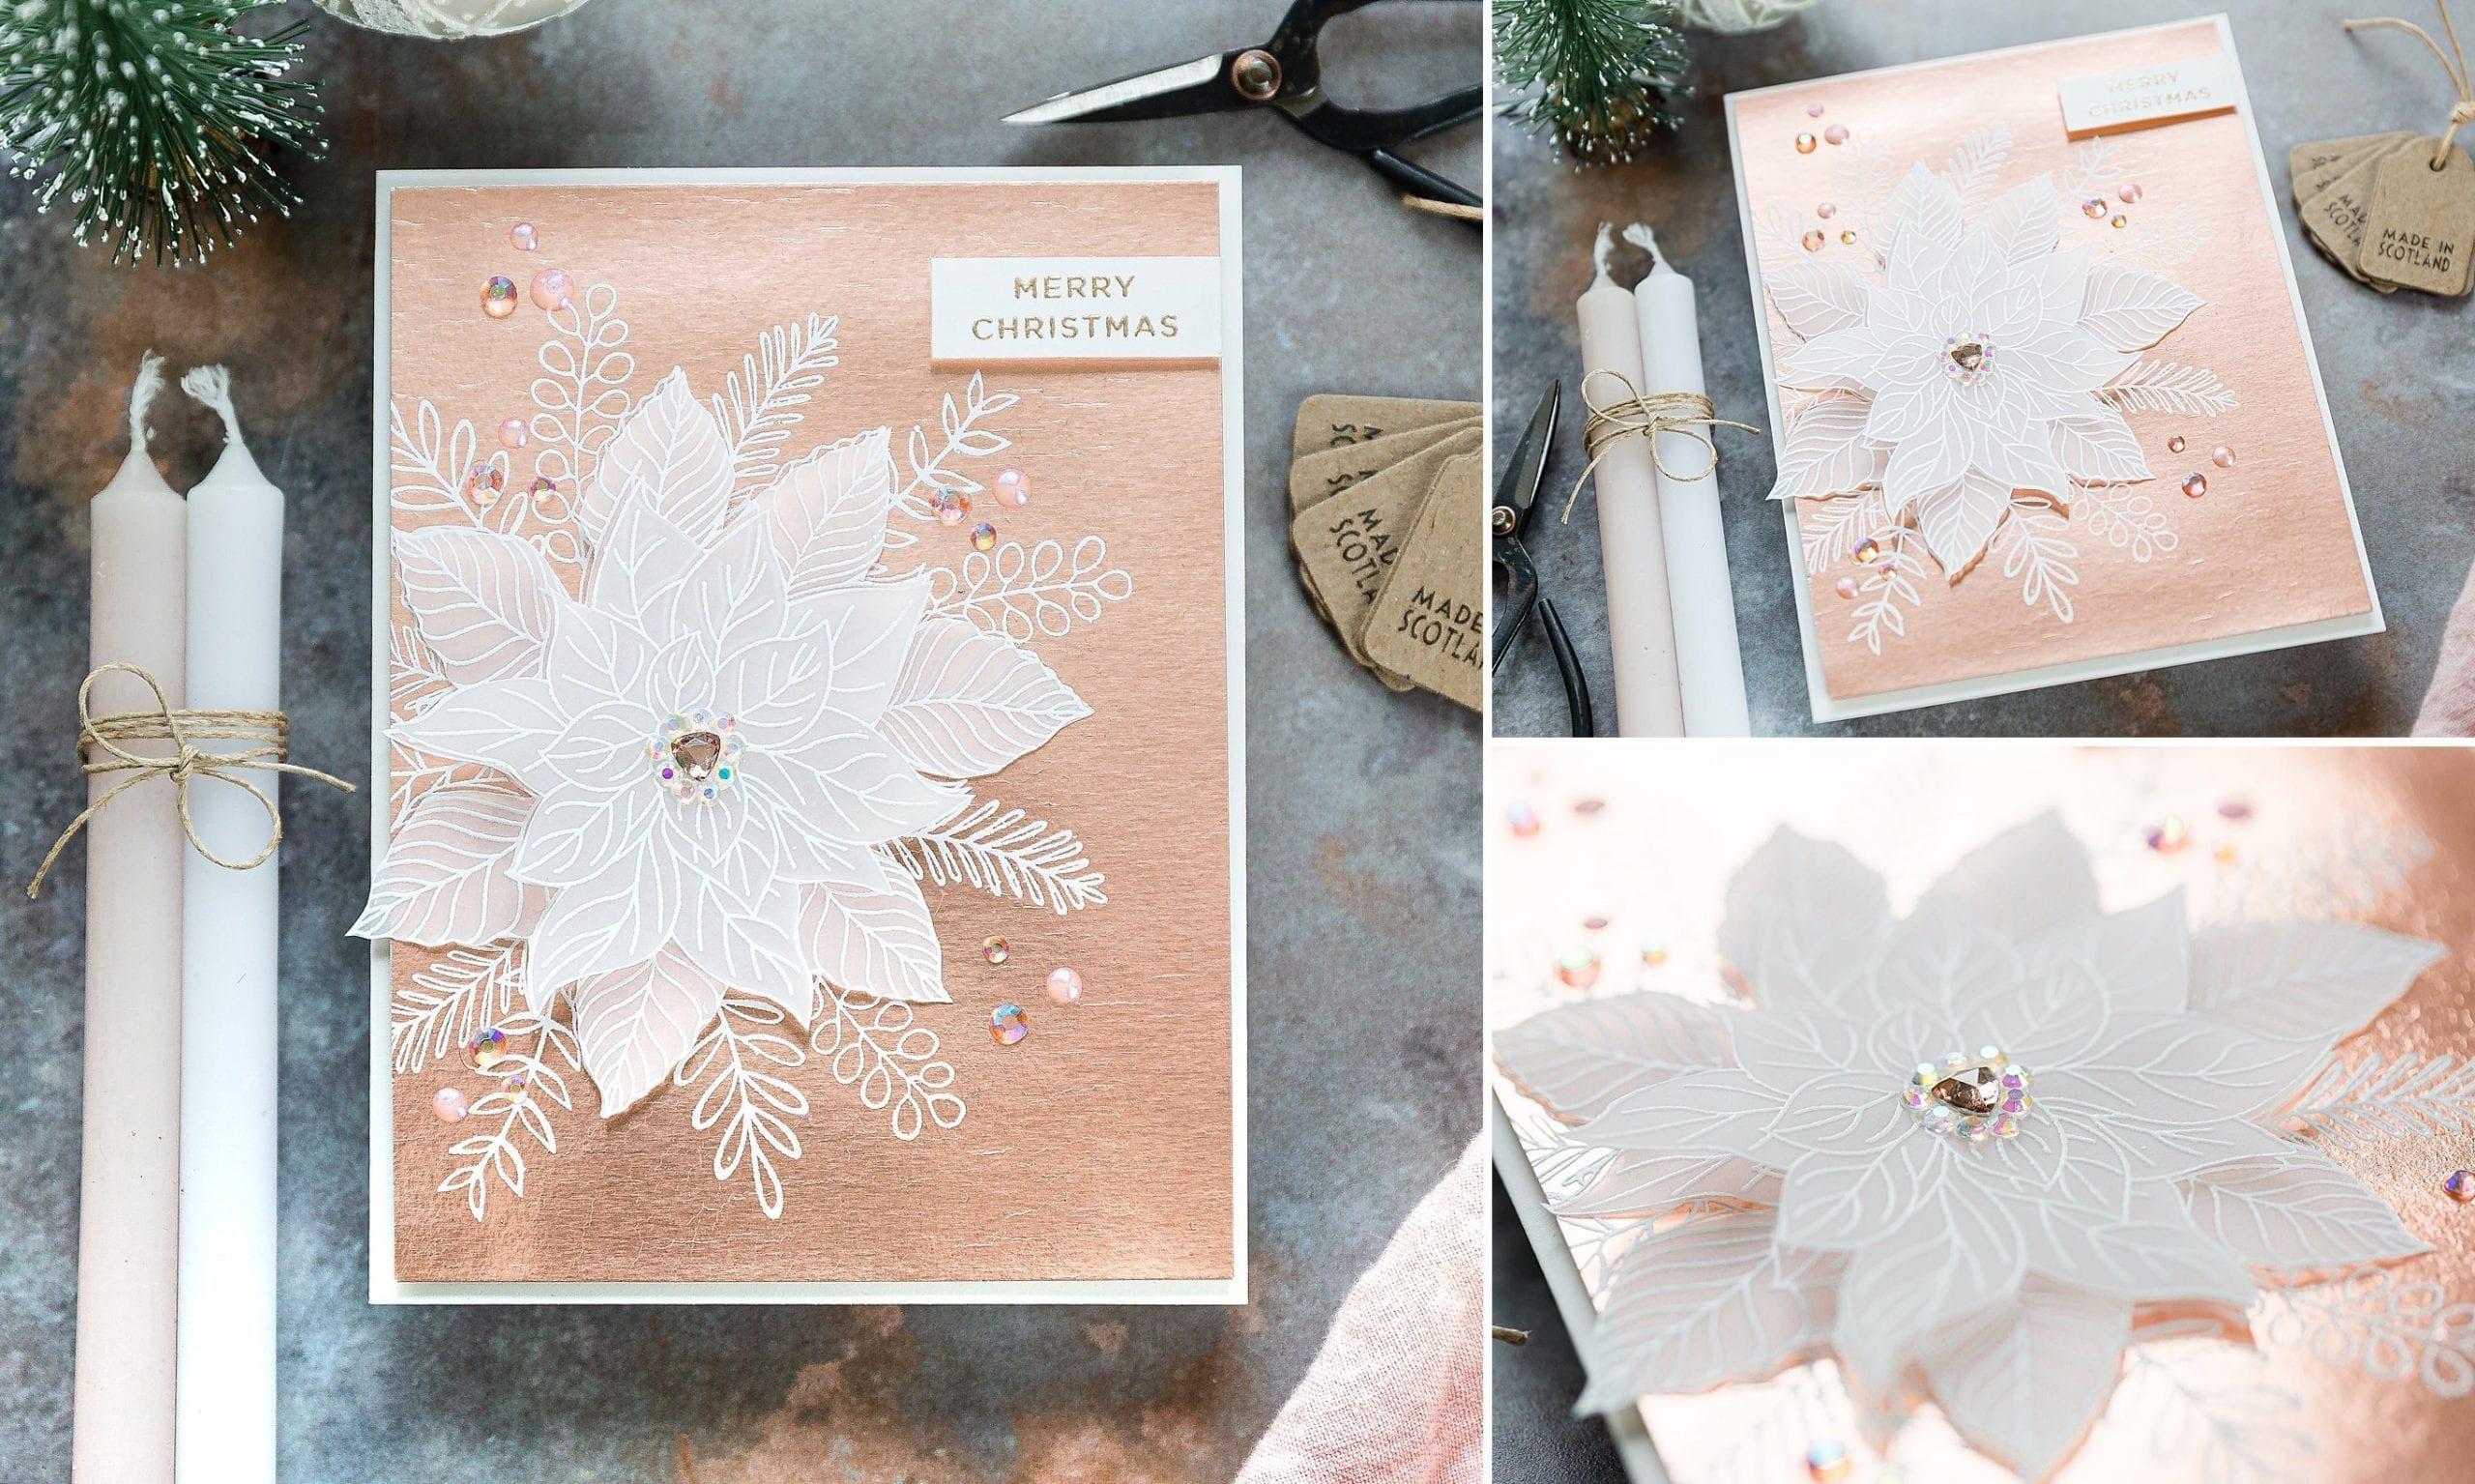 Gina K exclusive STAMPtember Festive Floral set. Handmade Christmas card by Debby Hughes. Find out more here: https://limedoodledesign.com/2019/09/gina-k-stamptember/